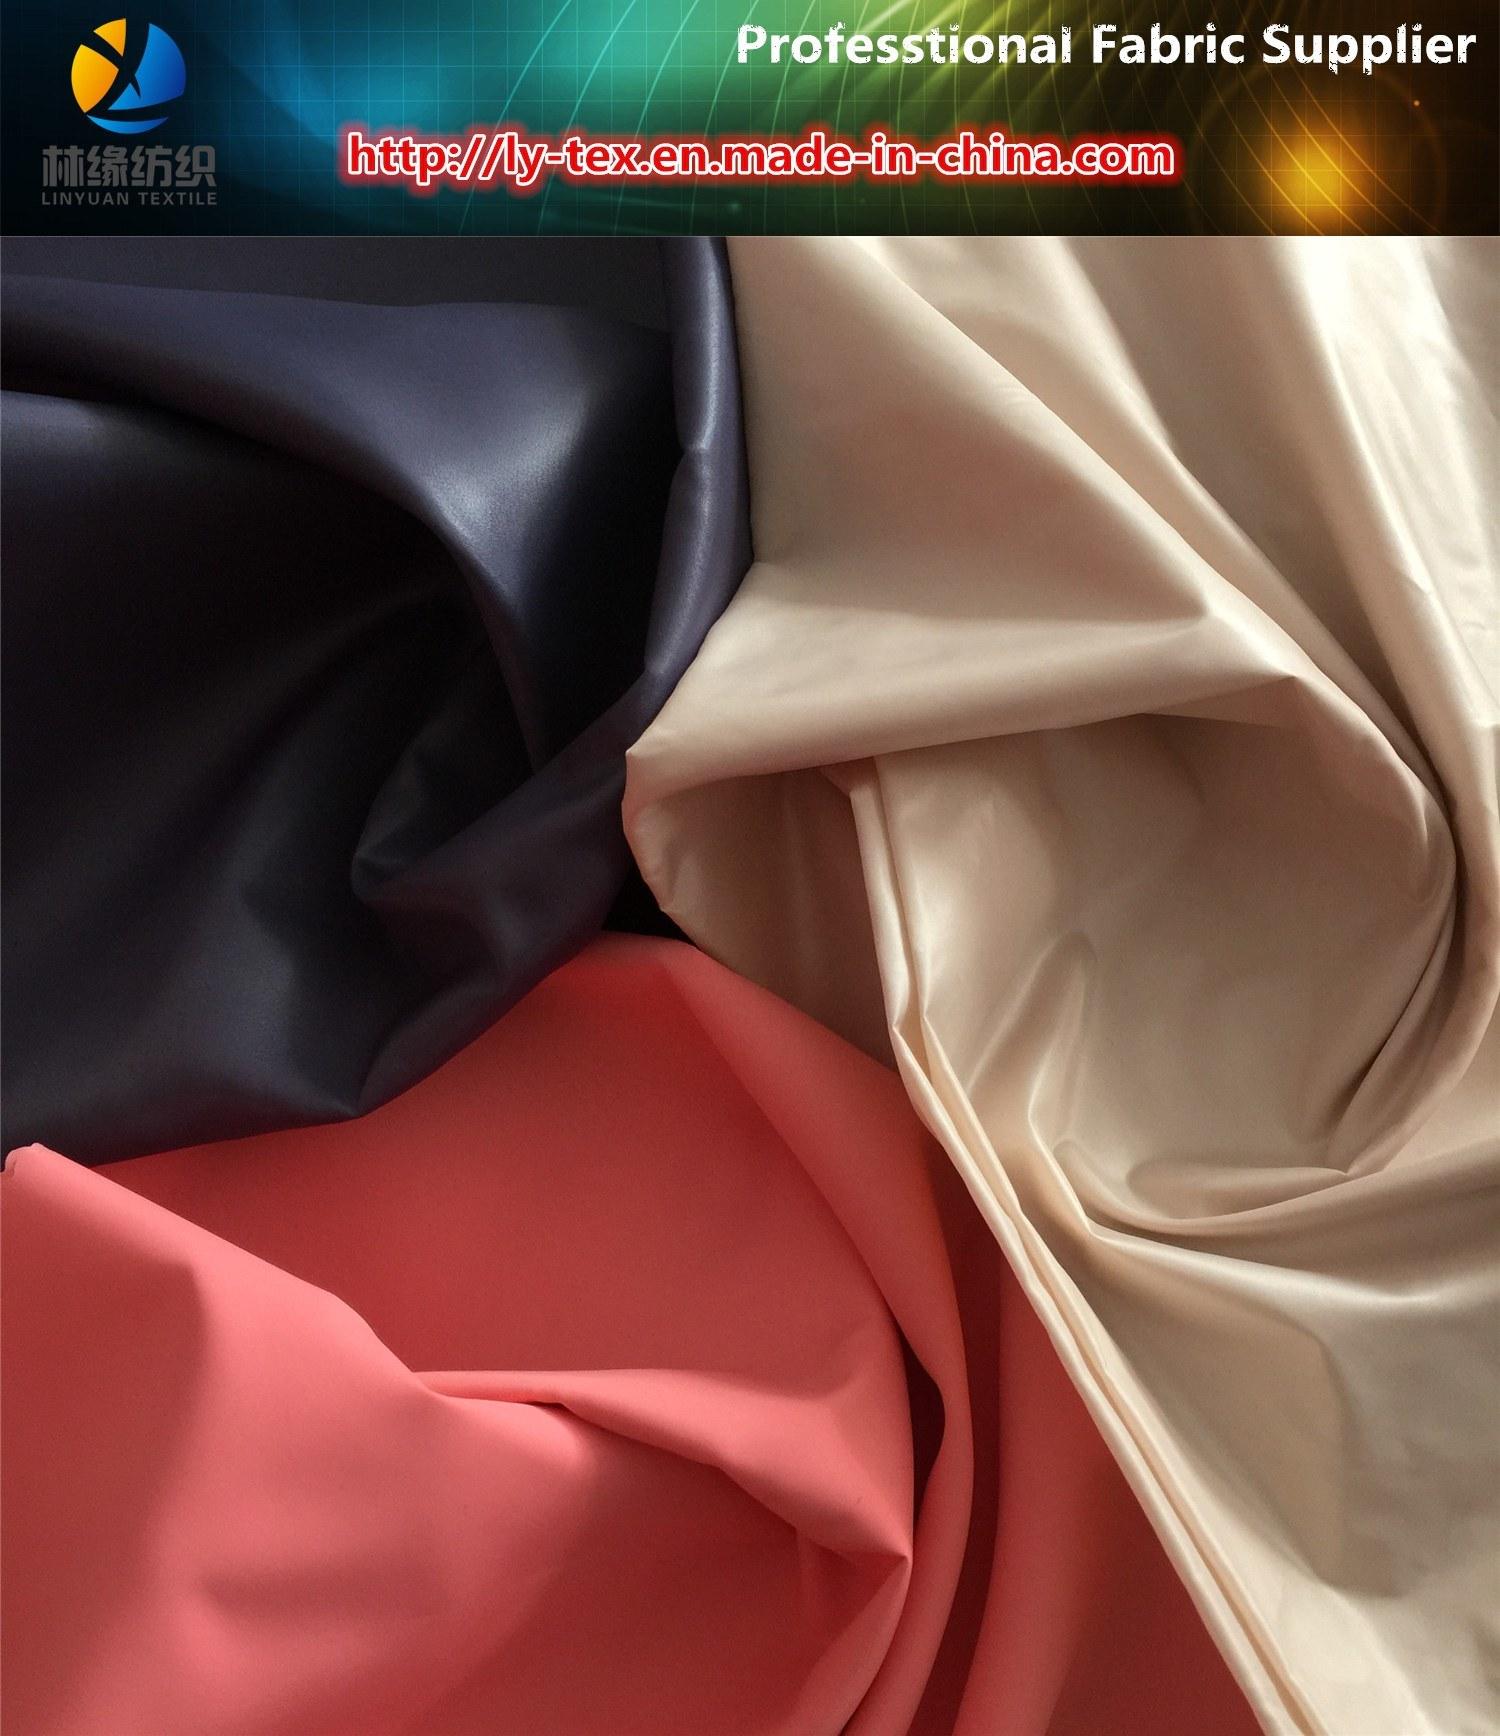 380t Polyester Taffeta, High Density Polyester Fabric for Garment